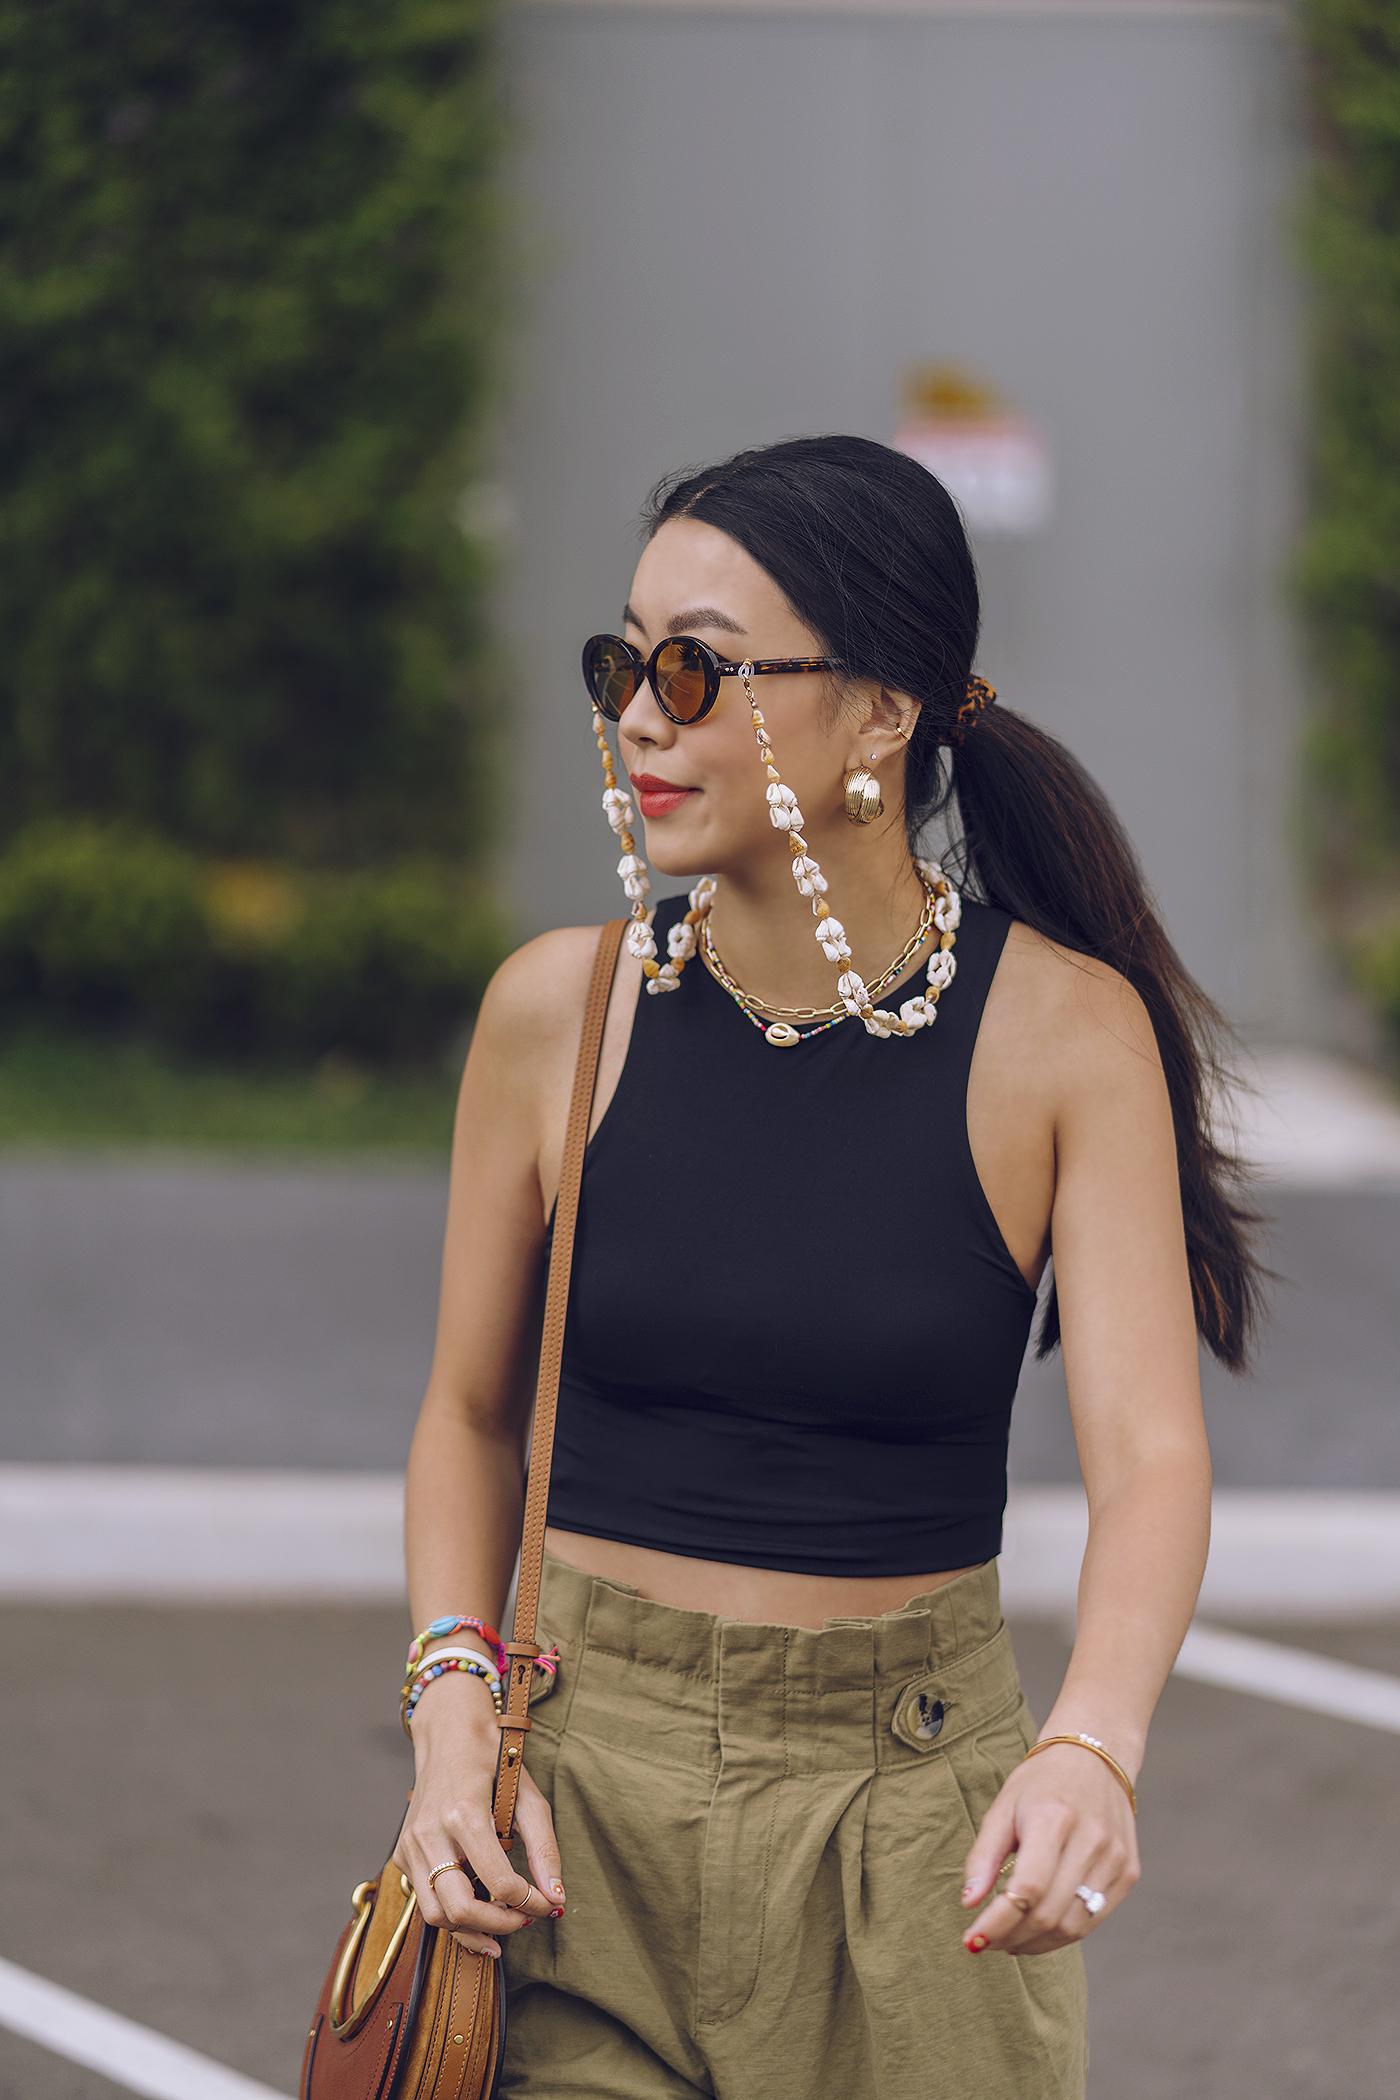 puka shell sunglasses chain